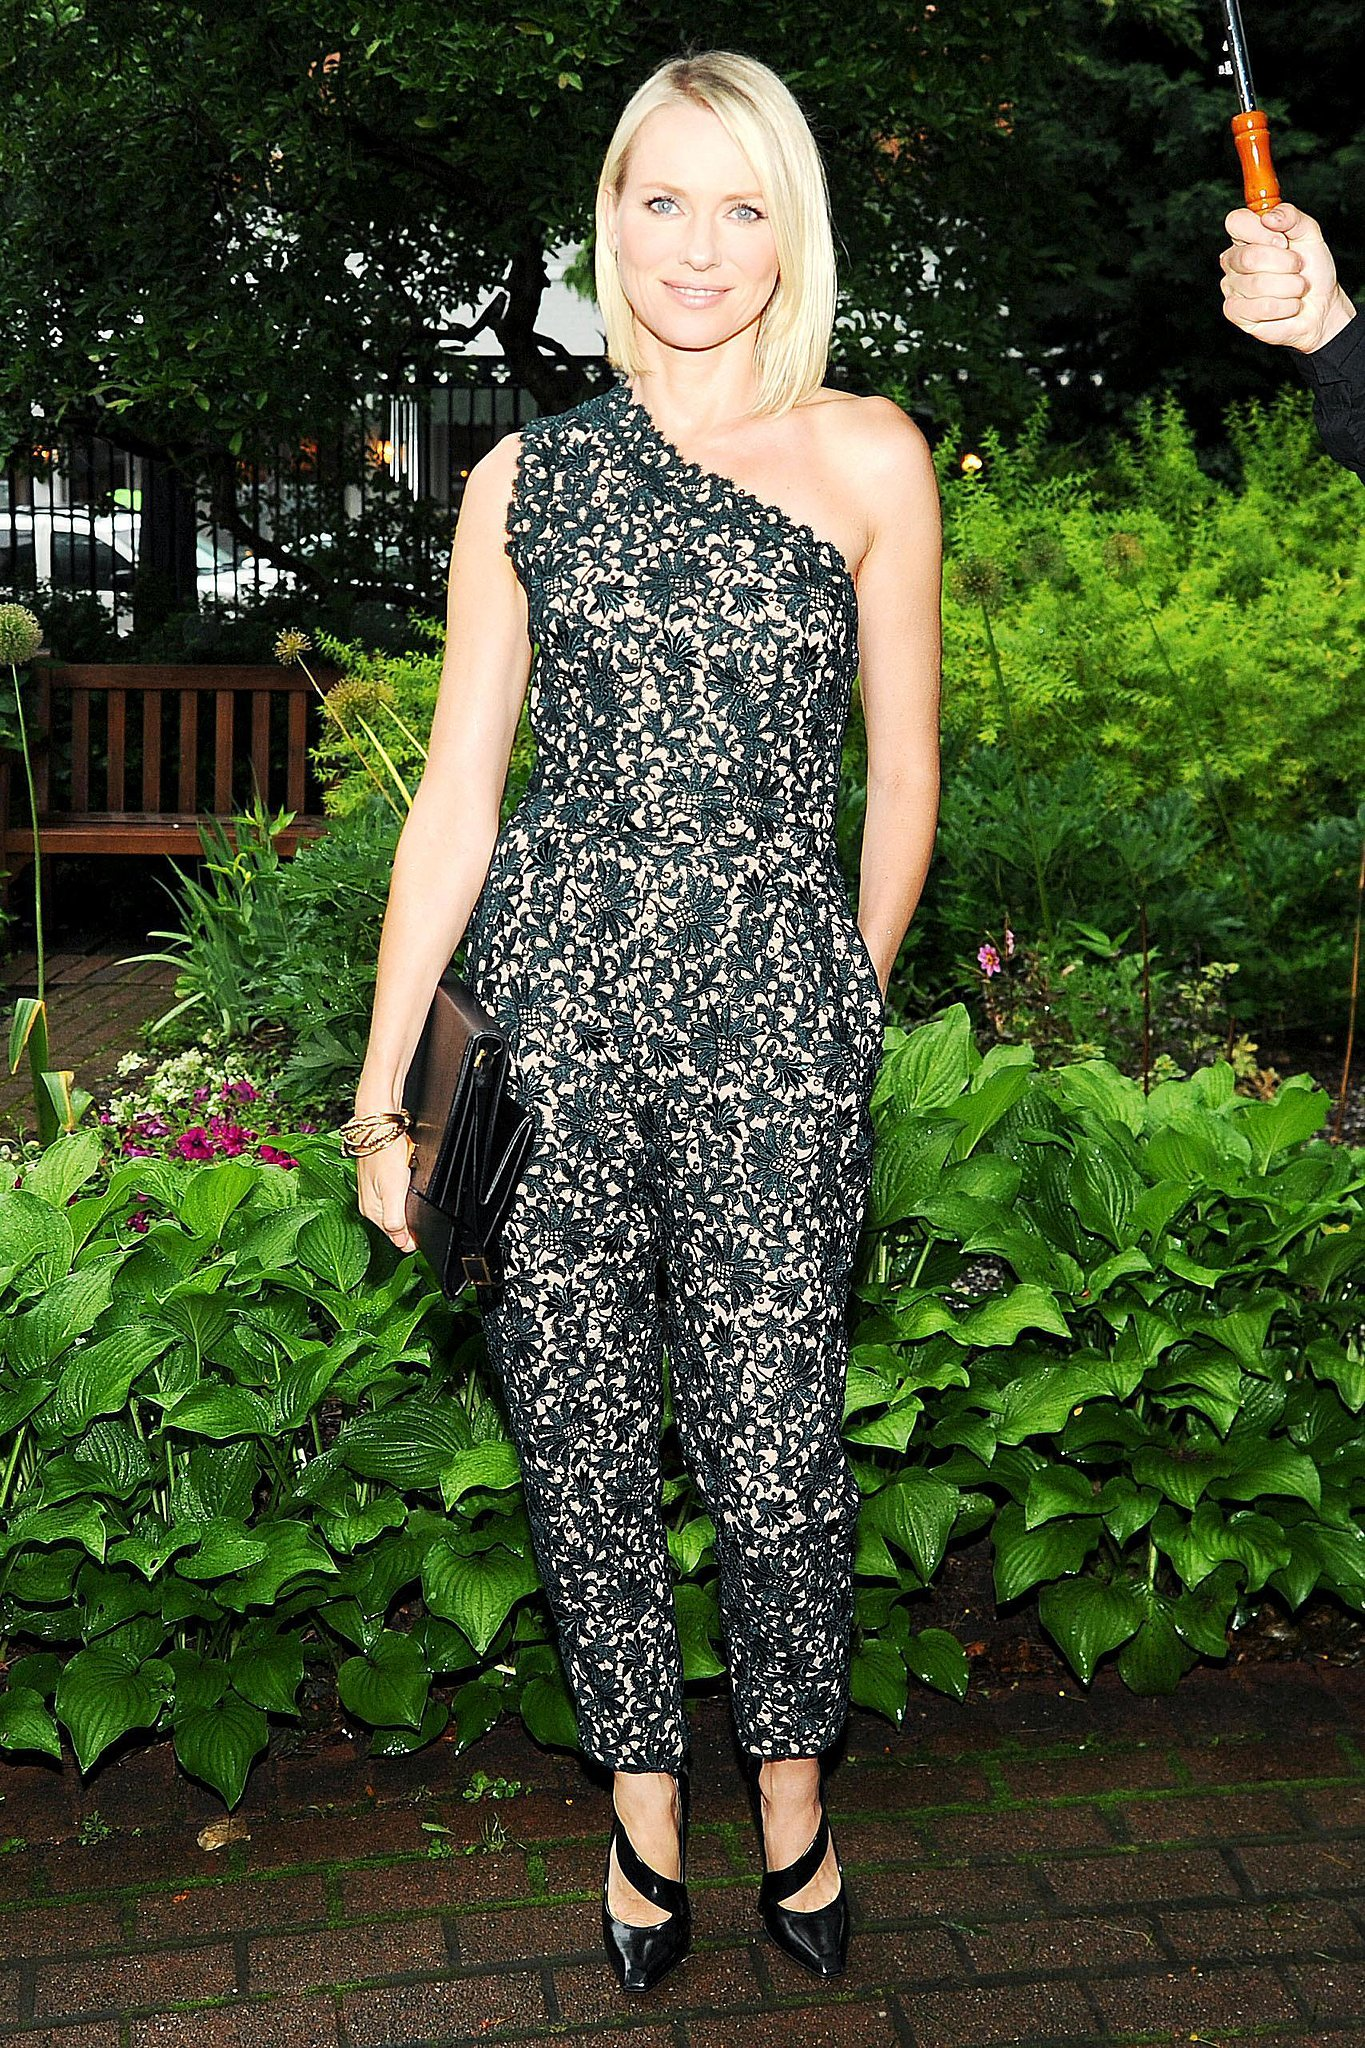 Naomi Watts at Stella McCartney's Resort 2014 presentation in New York. Source: Billy Farrell/BFAnyc.com